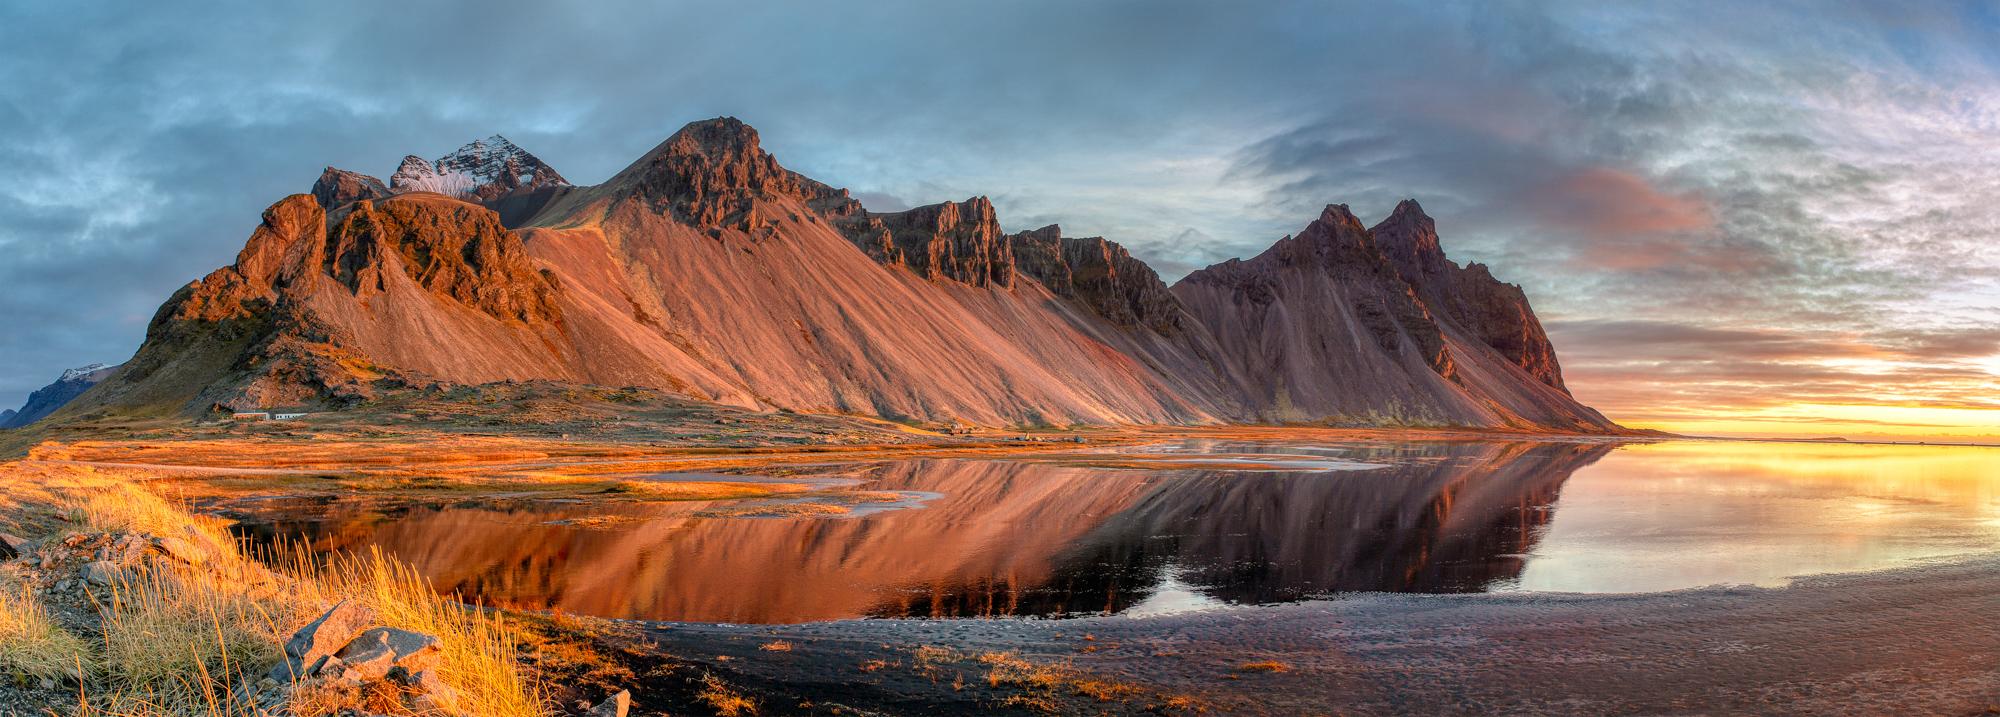 islandia-1357-Pano_AuroraHDR2019-edit.jpg